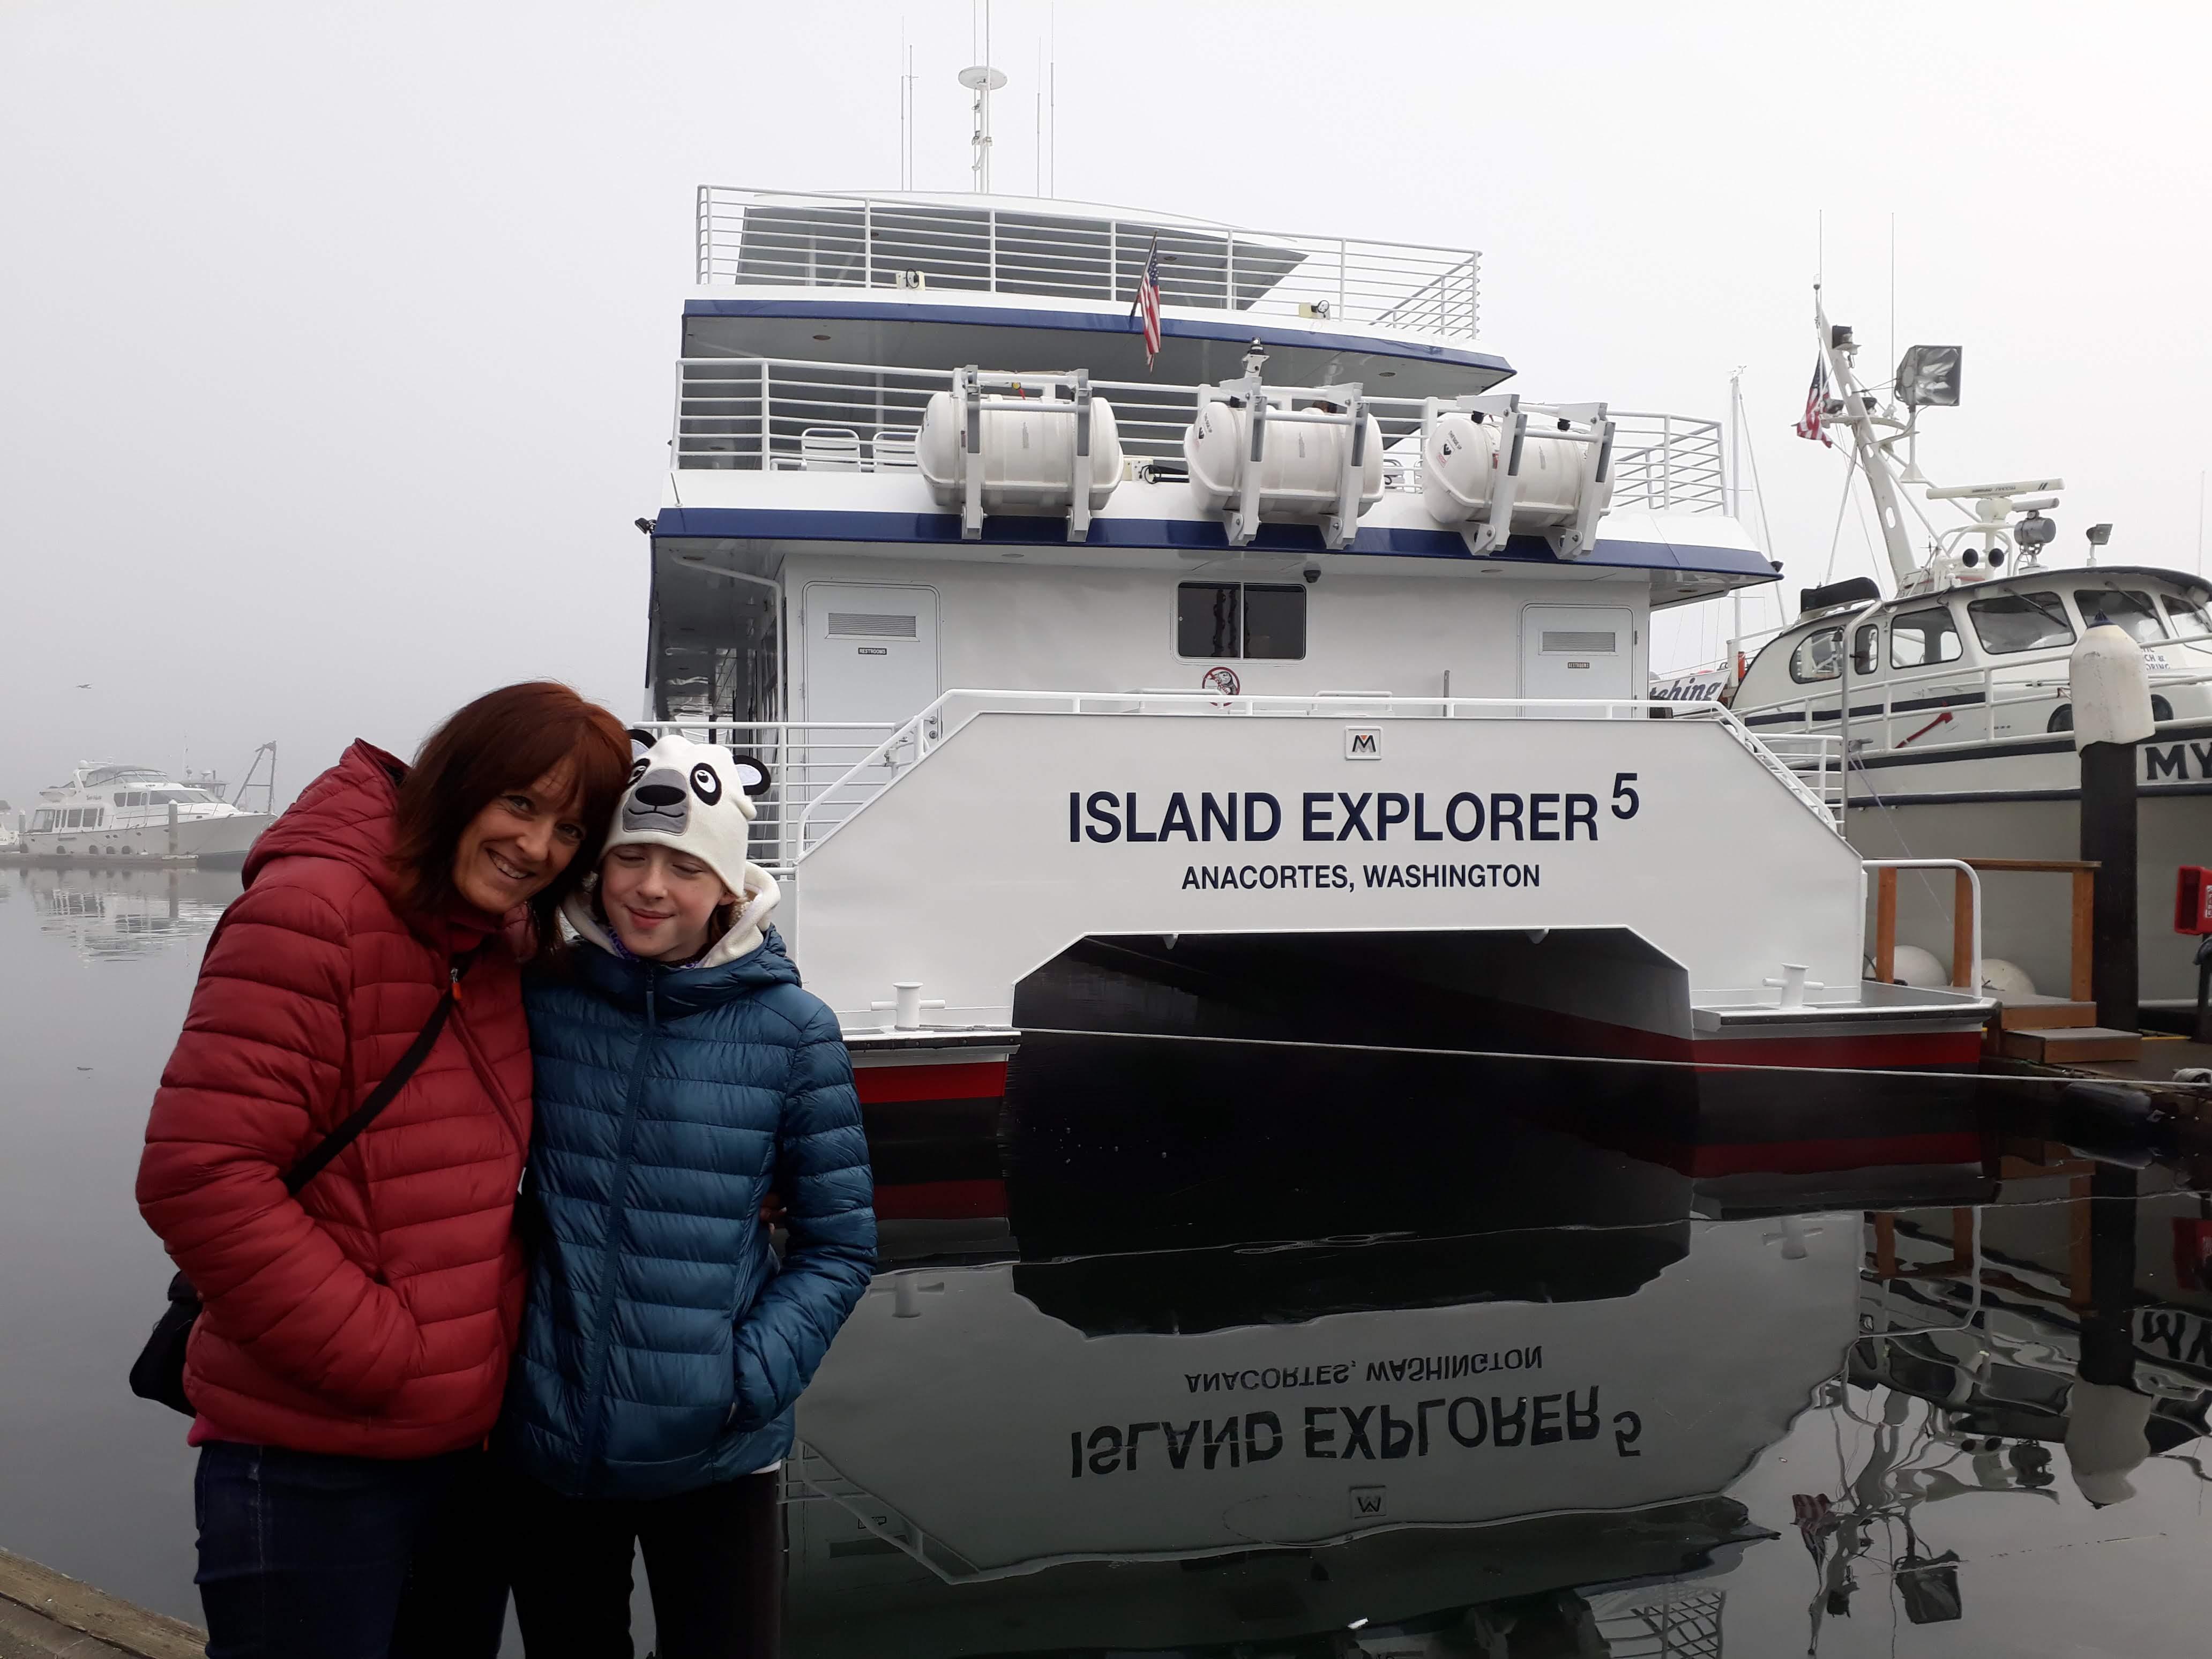 Anacortes whale watching - Island Explorer 5